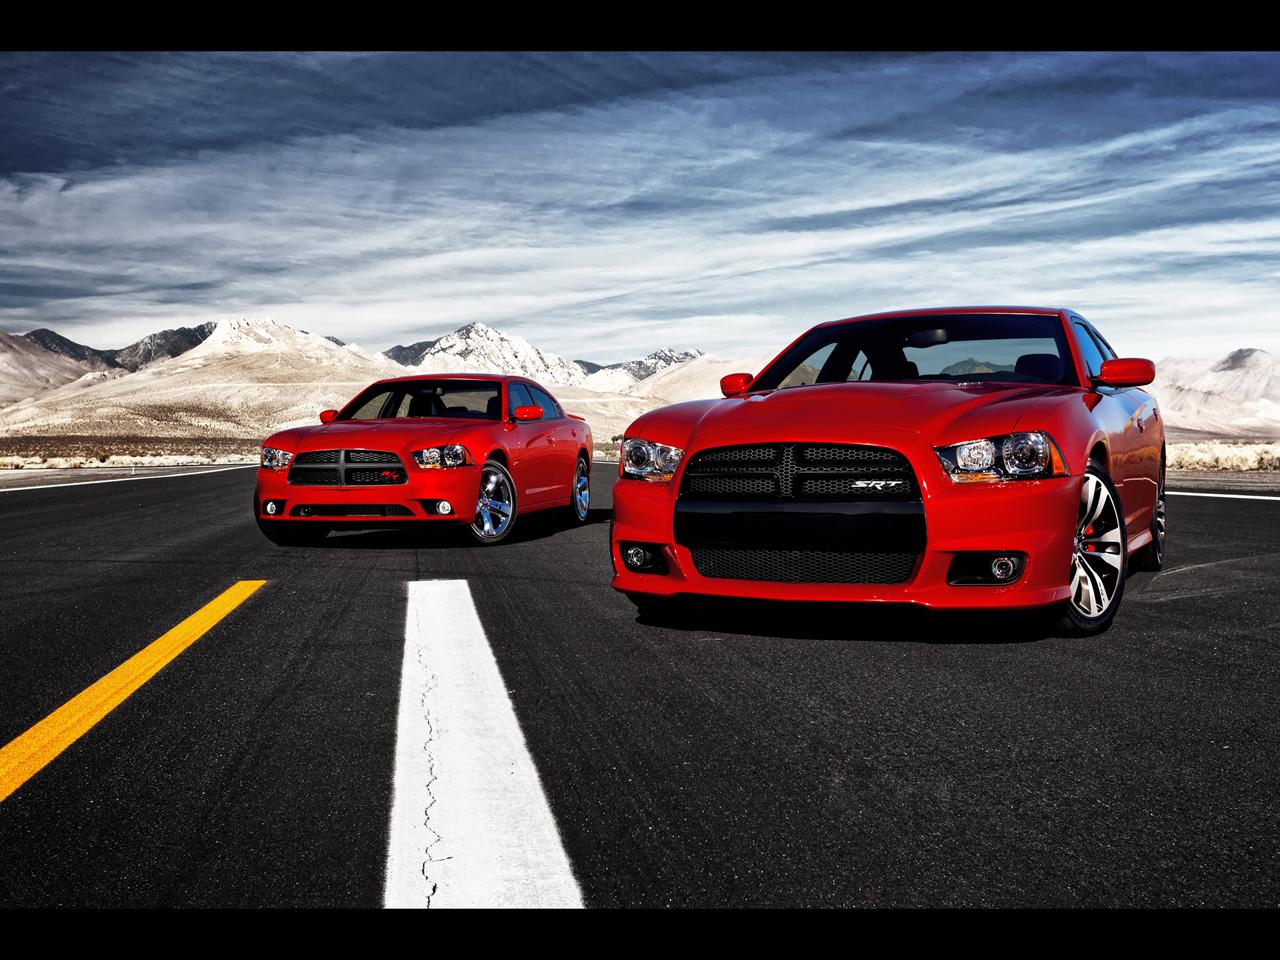 http://2.bp.blogspot.com/-24TKPGUA7AQ/ThpPnarQ7OI/AAAAAAAAB4c/6U6i3GK7ygI/s1600/2012-Dodge-Charger-SRT8-2011-Dodge-Charger-RT-1280x960.jpg